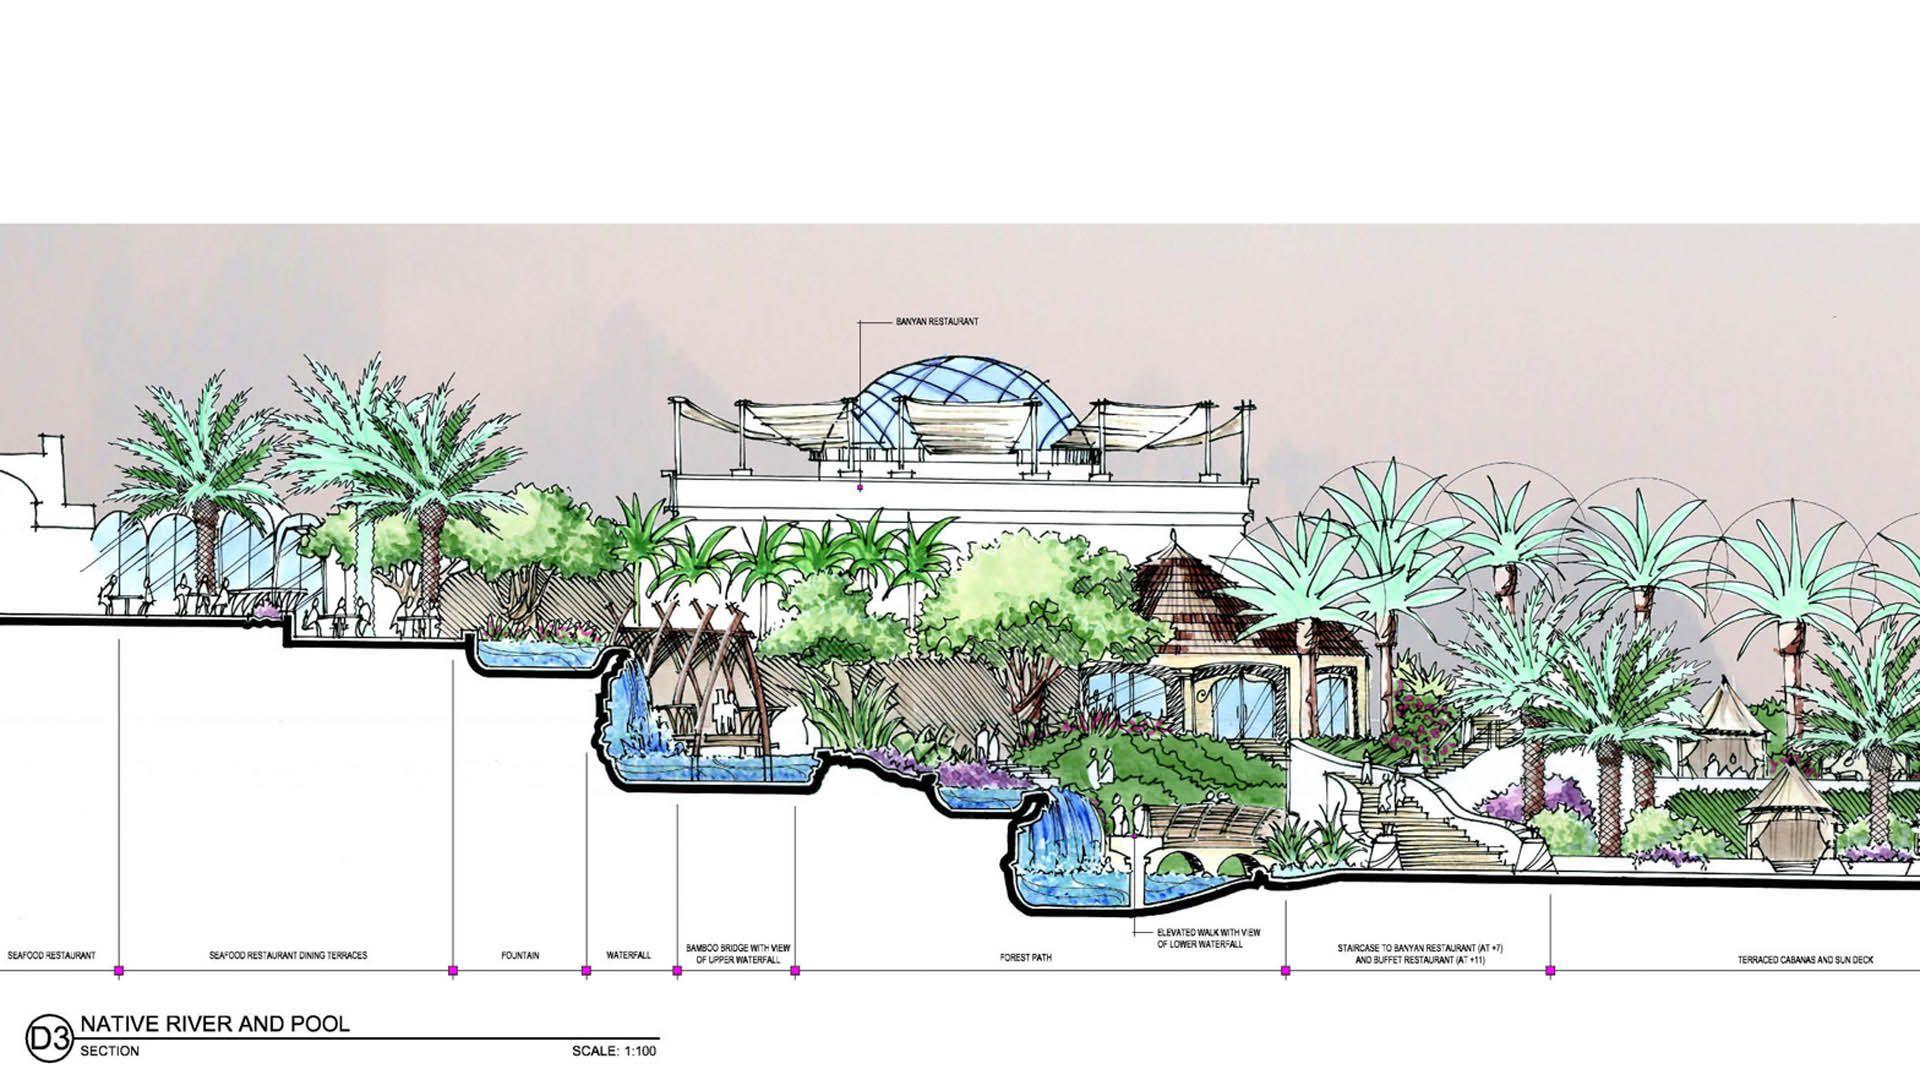 Resort Elevation Plan : Dinning room sectional elevation